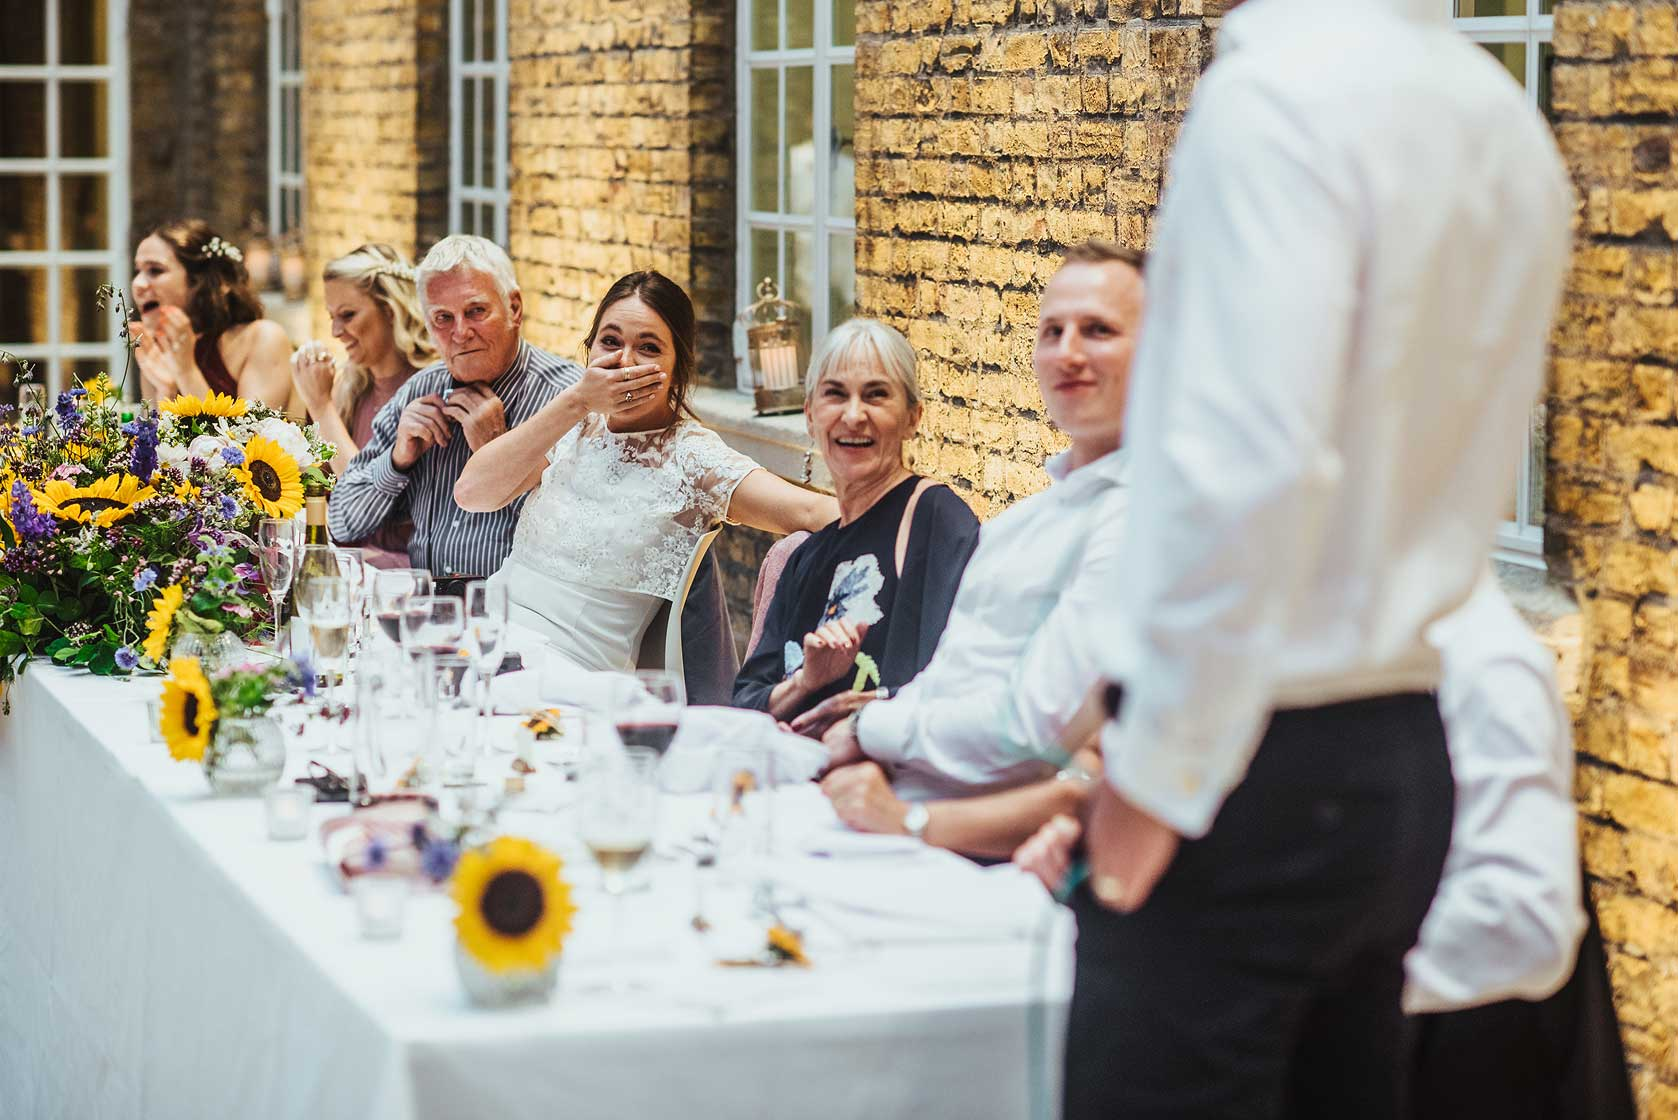 Wedding Photography at Hackney Town Hall